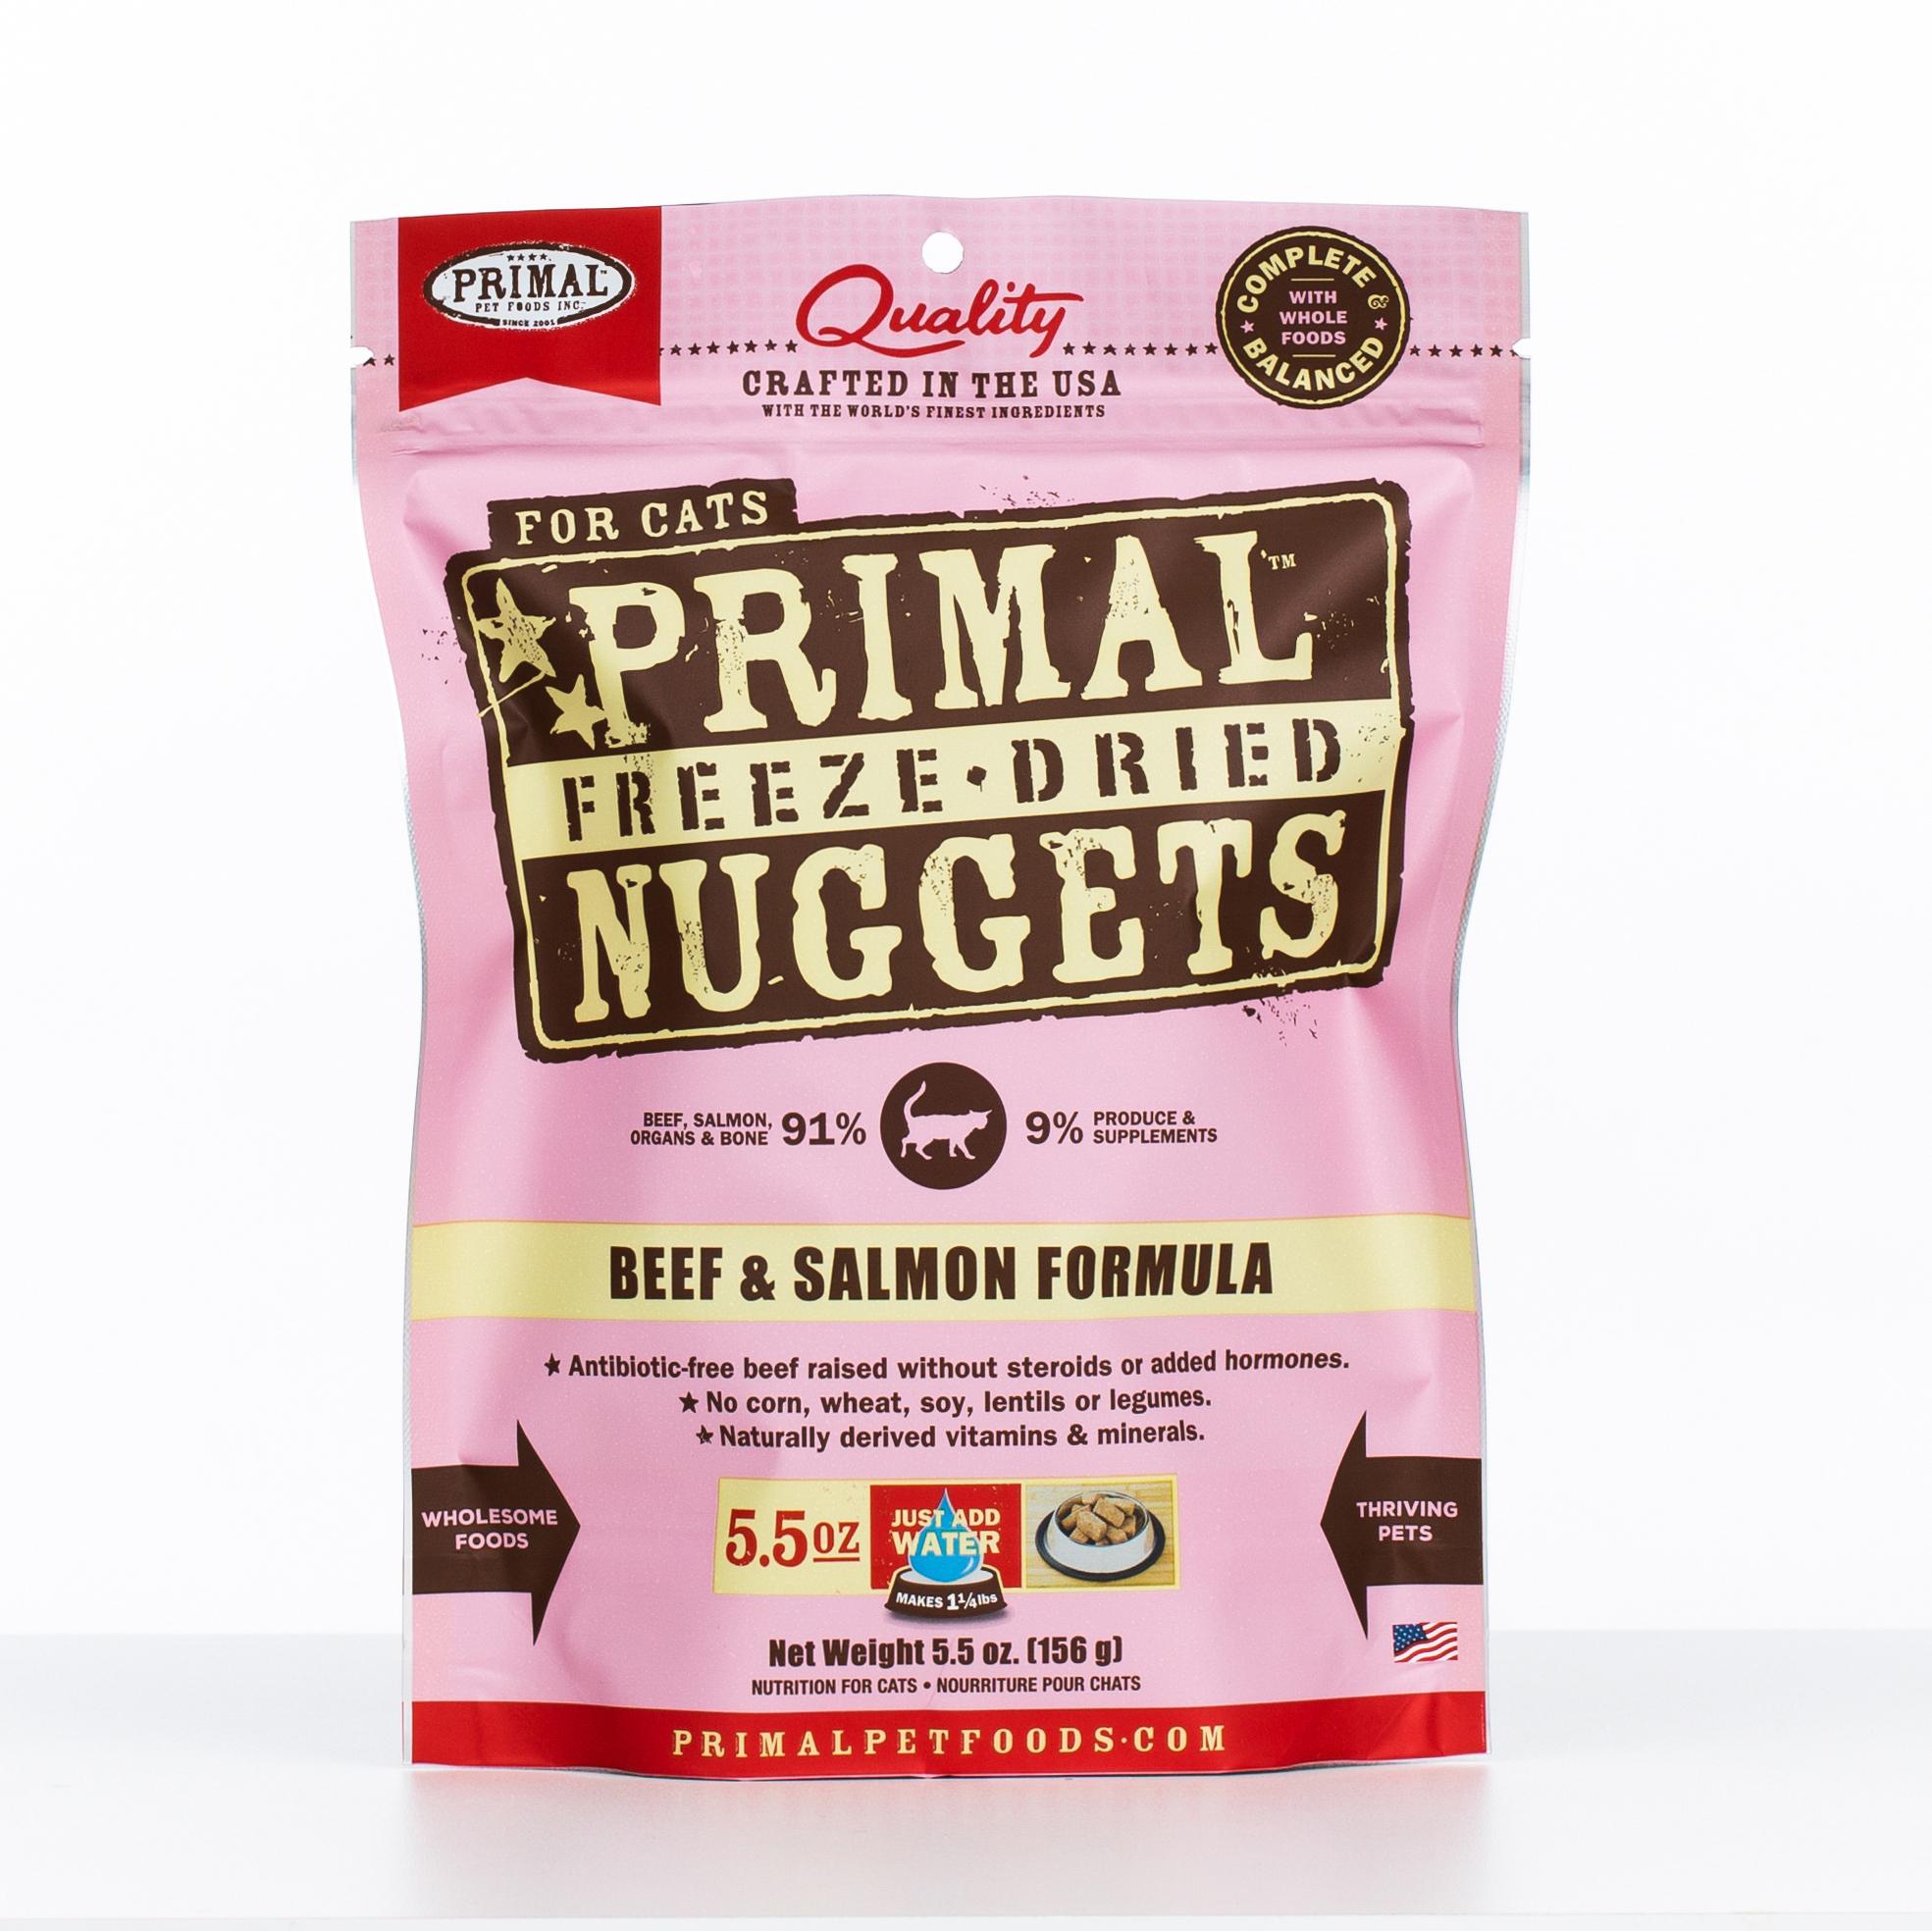 Primal Raw Freeze-Dried Nuggets Beef & Salmon Formula Cat Food Image